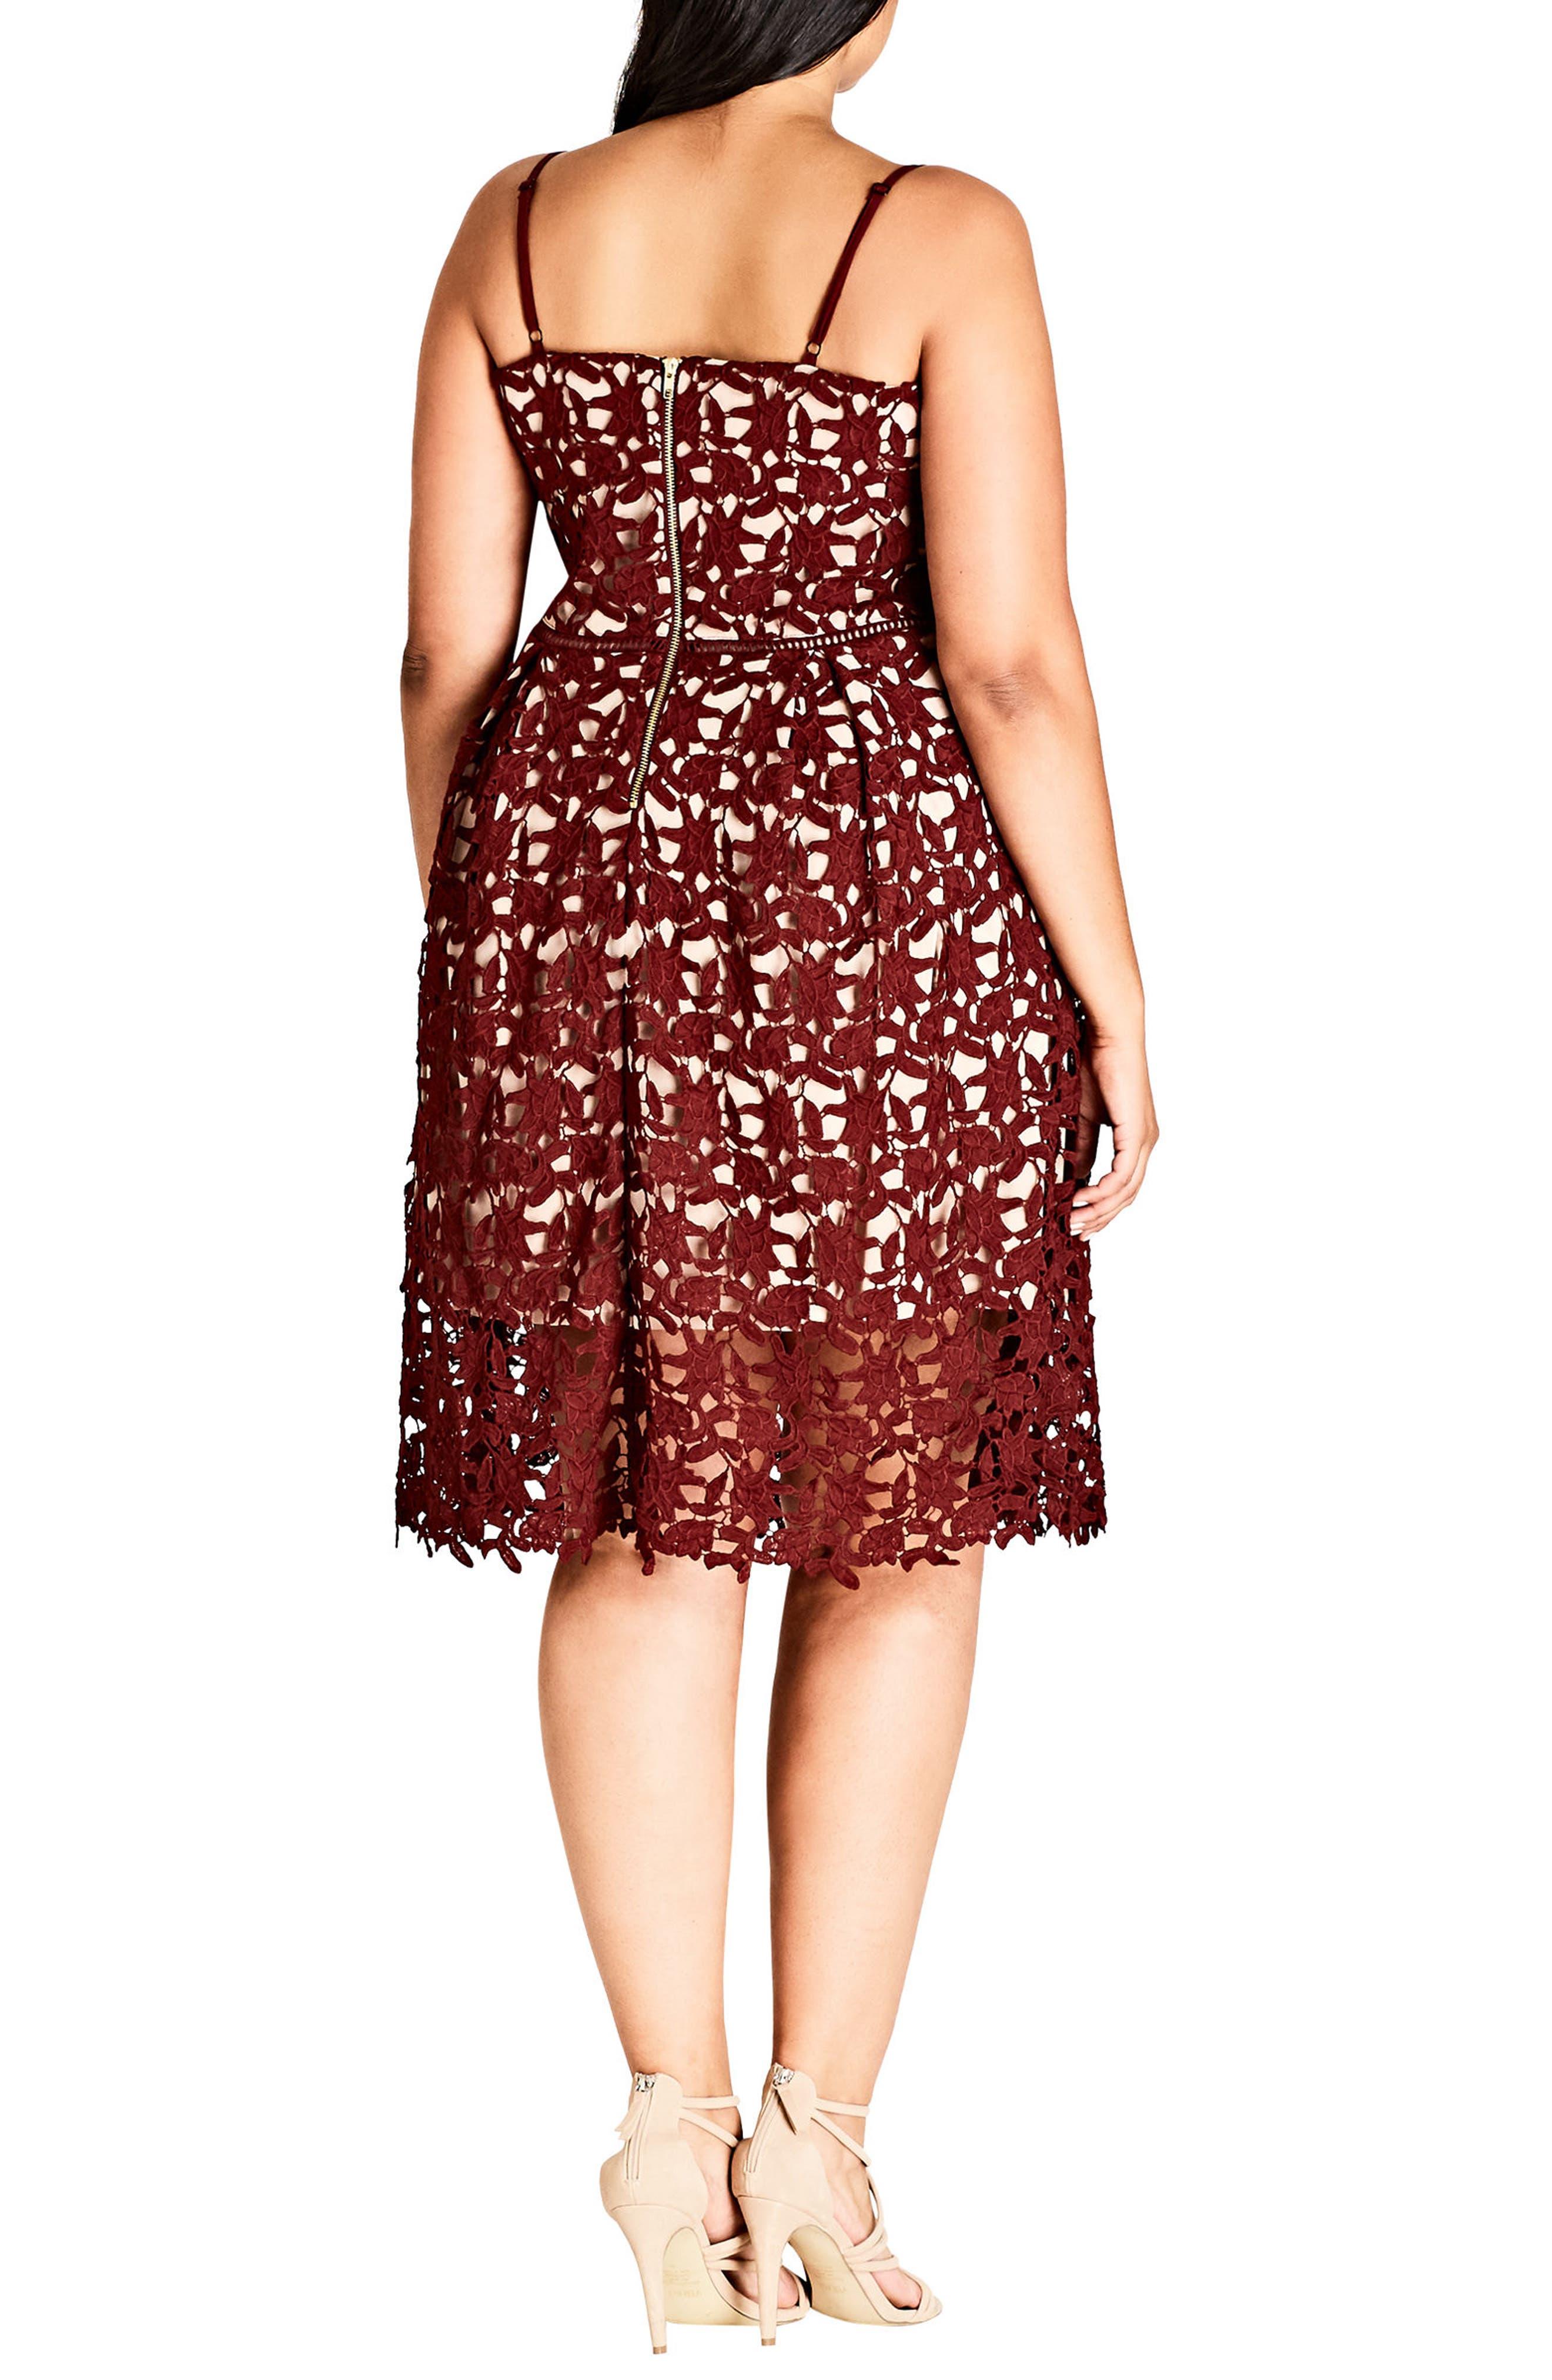 CITY CHIC,                             So Fancy Lace Dress,                             Alternate thumbnail 2, color,                             605